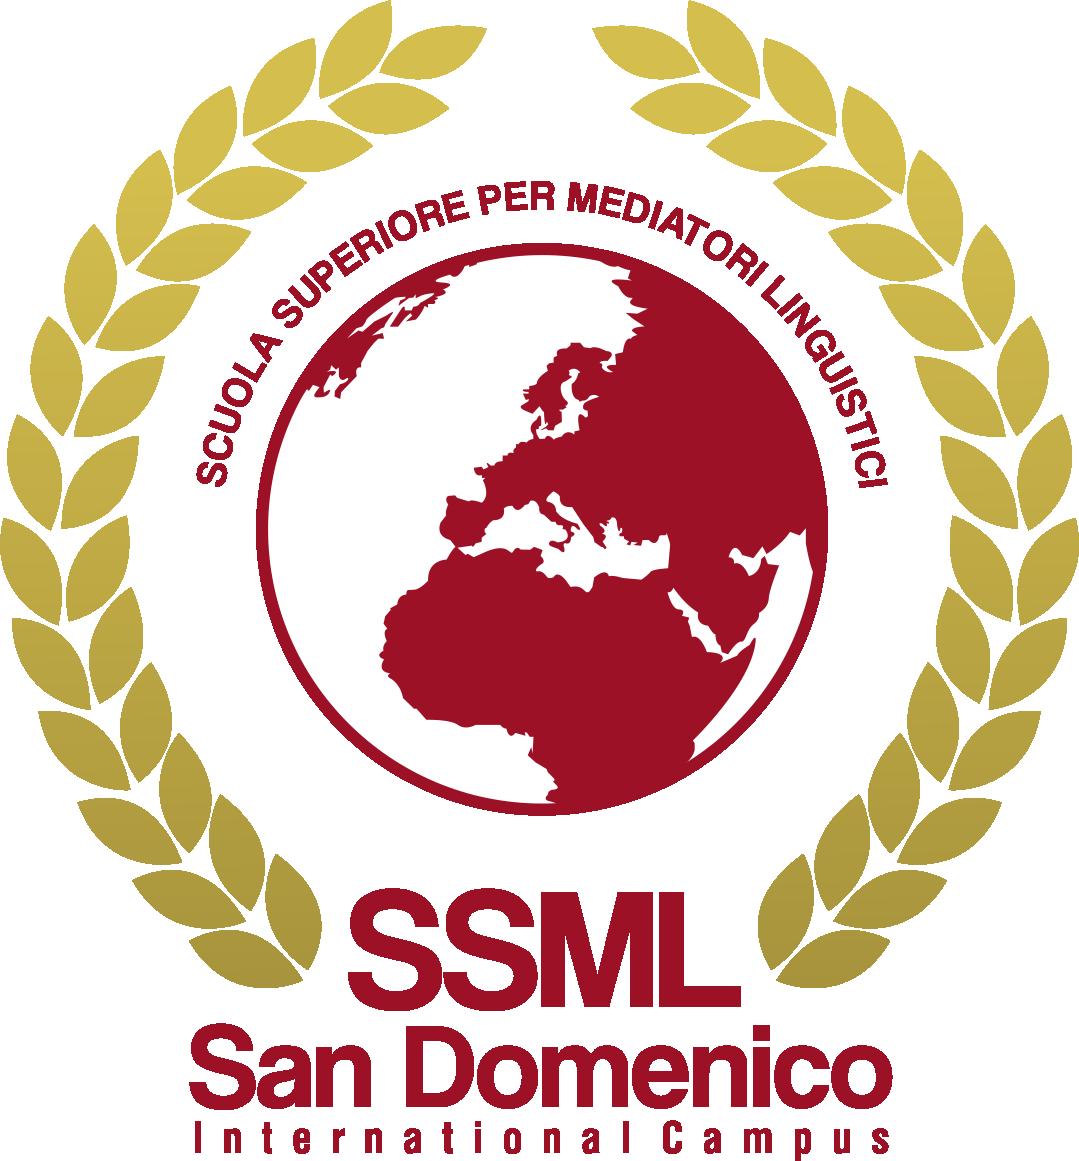 LogosSanDomenico1